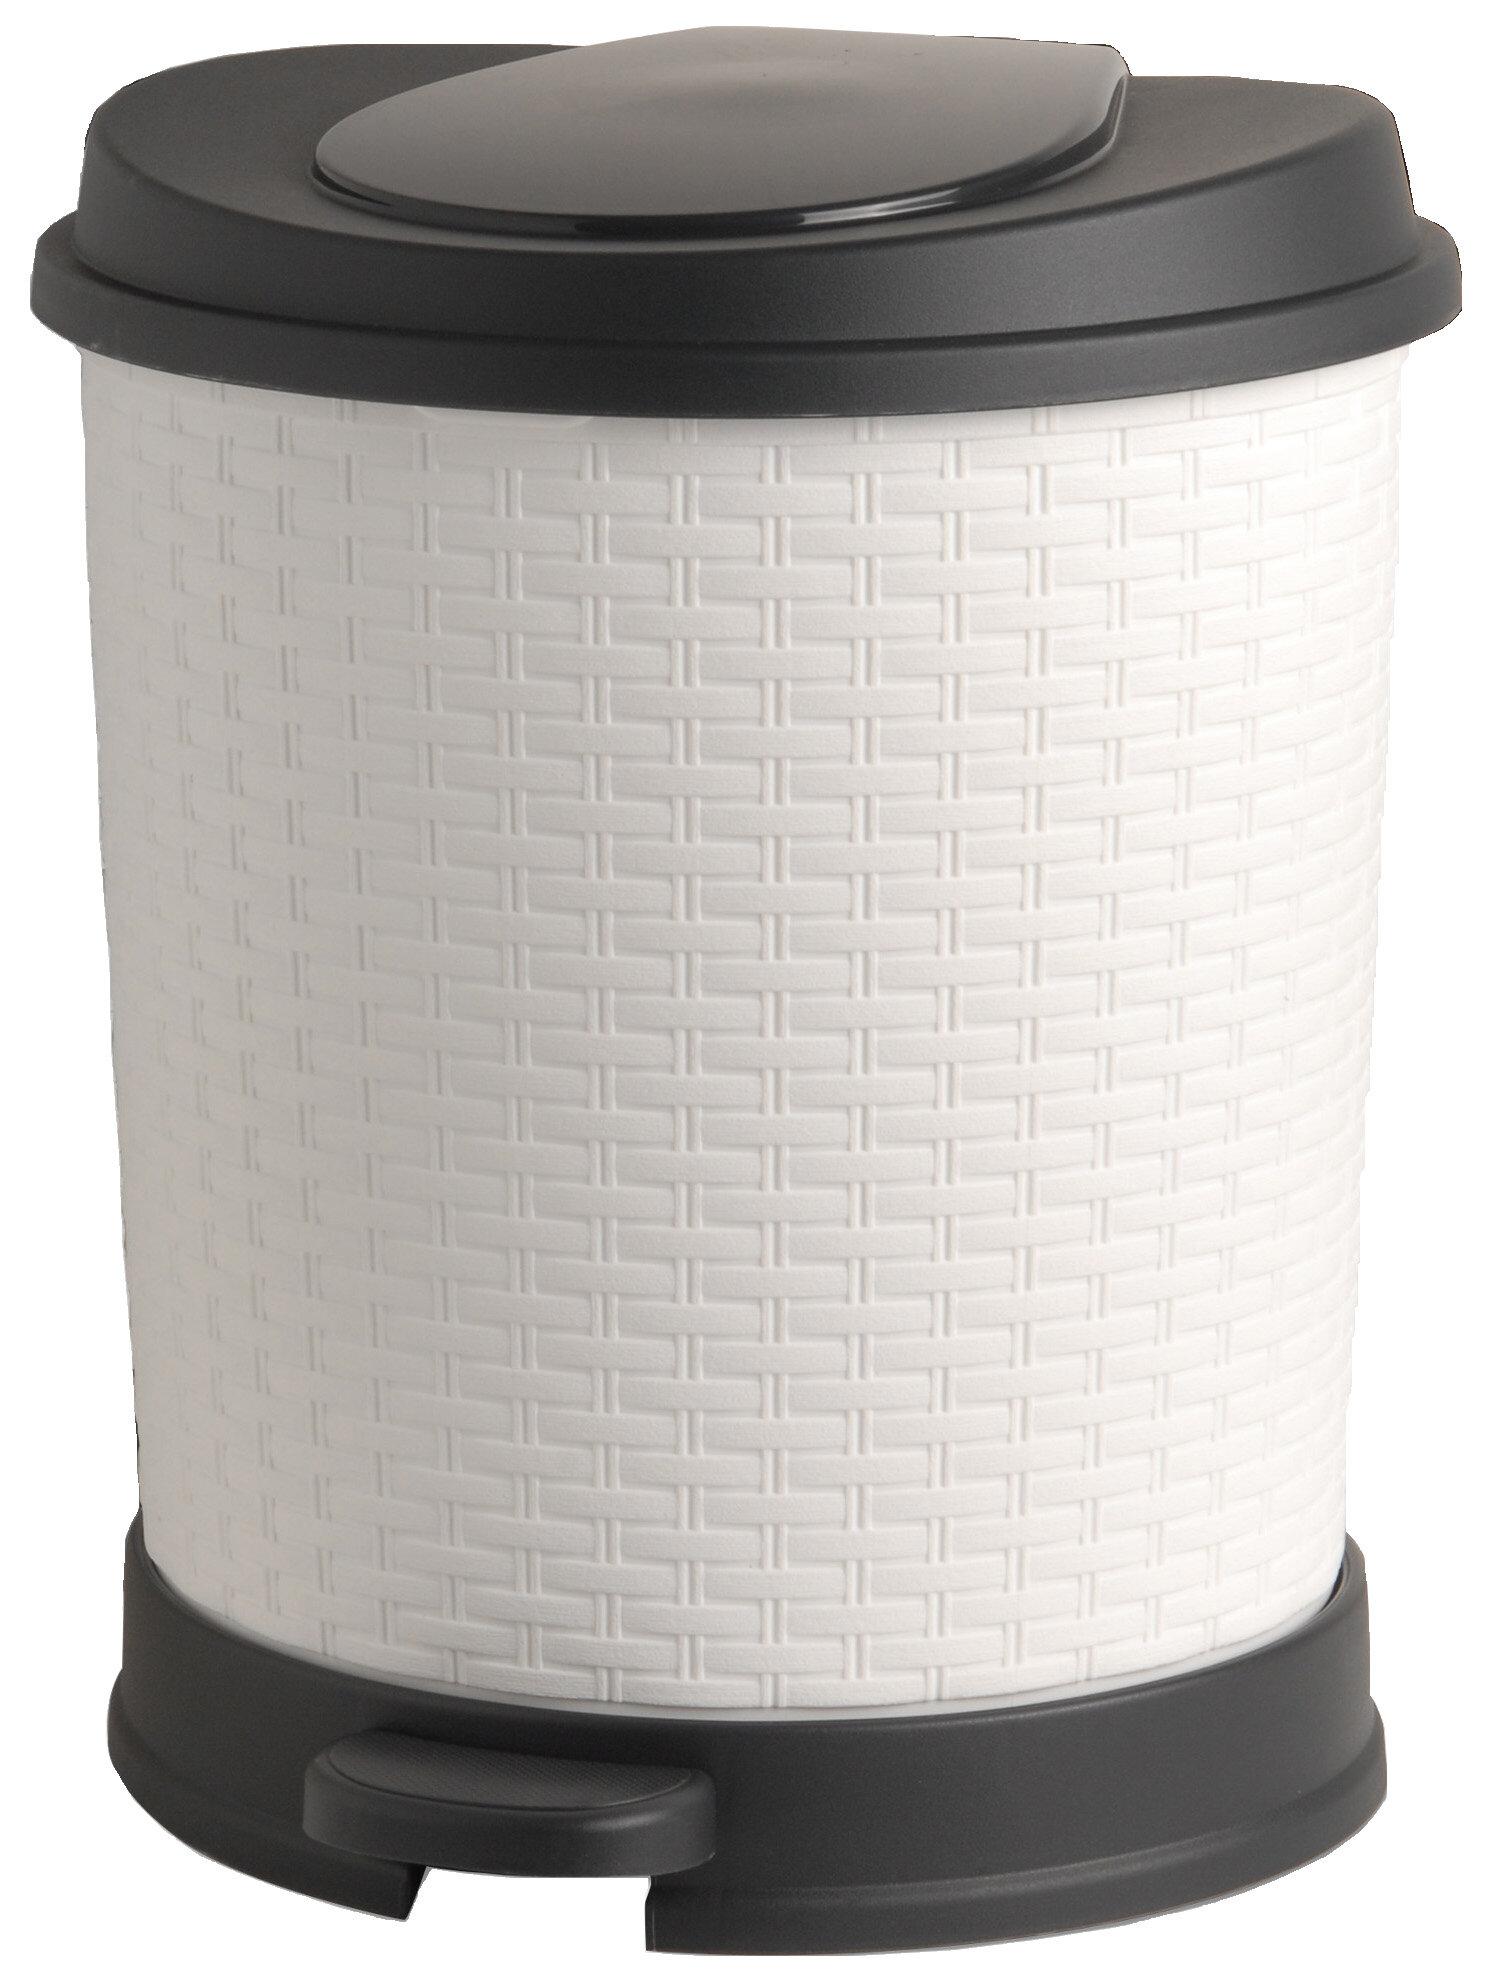 Superior Performance Plastic 5 5 Gallon Step Trash Can & Reviews